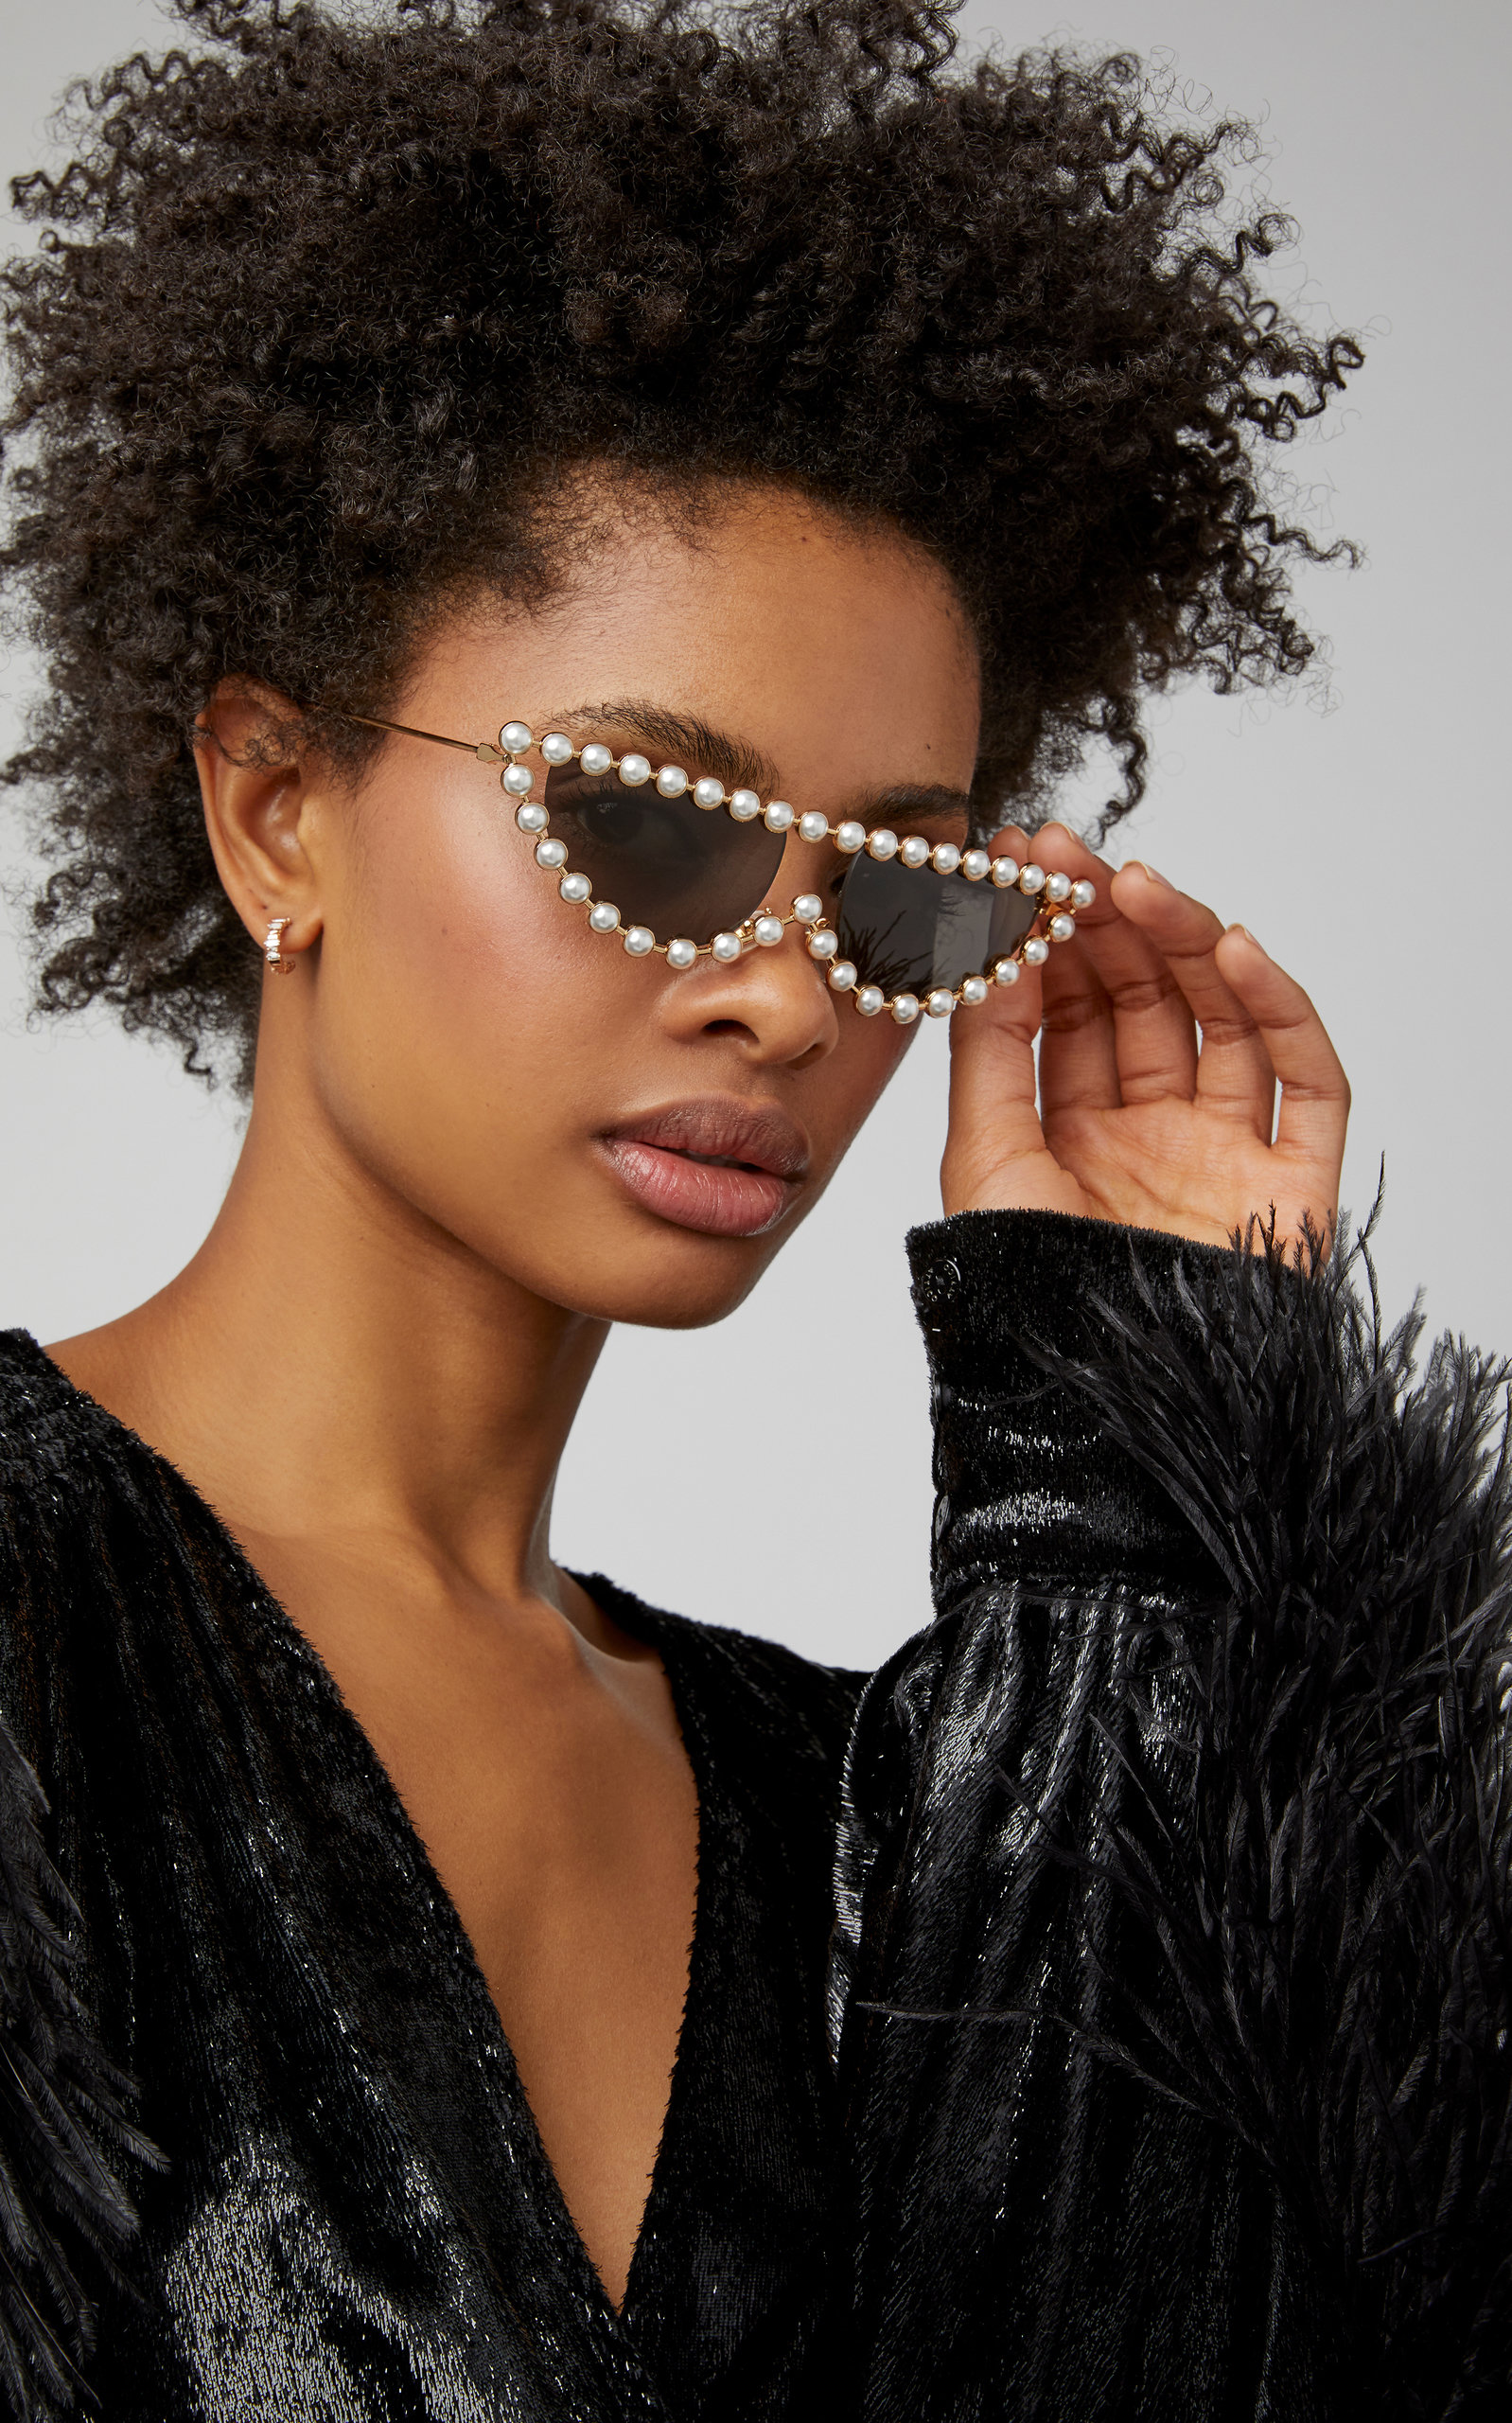 c266bcbd56 Faux Pearl-Embellished Cat-Eye Sunglasses by Gucci Sunglasses